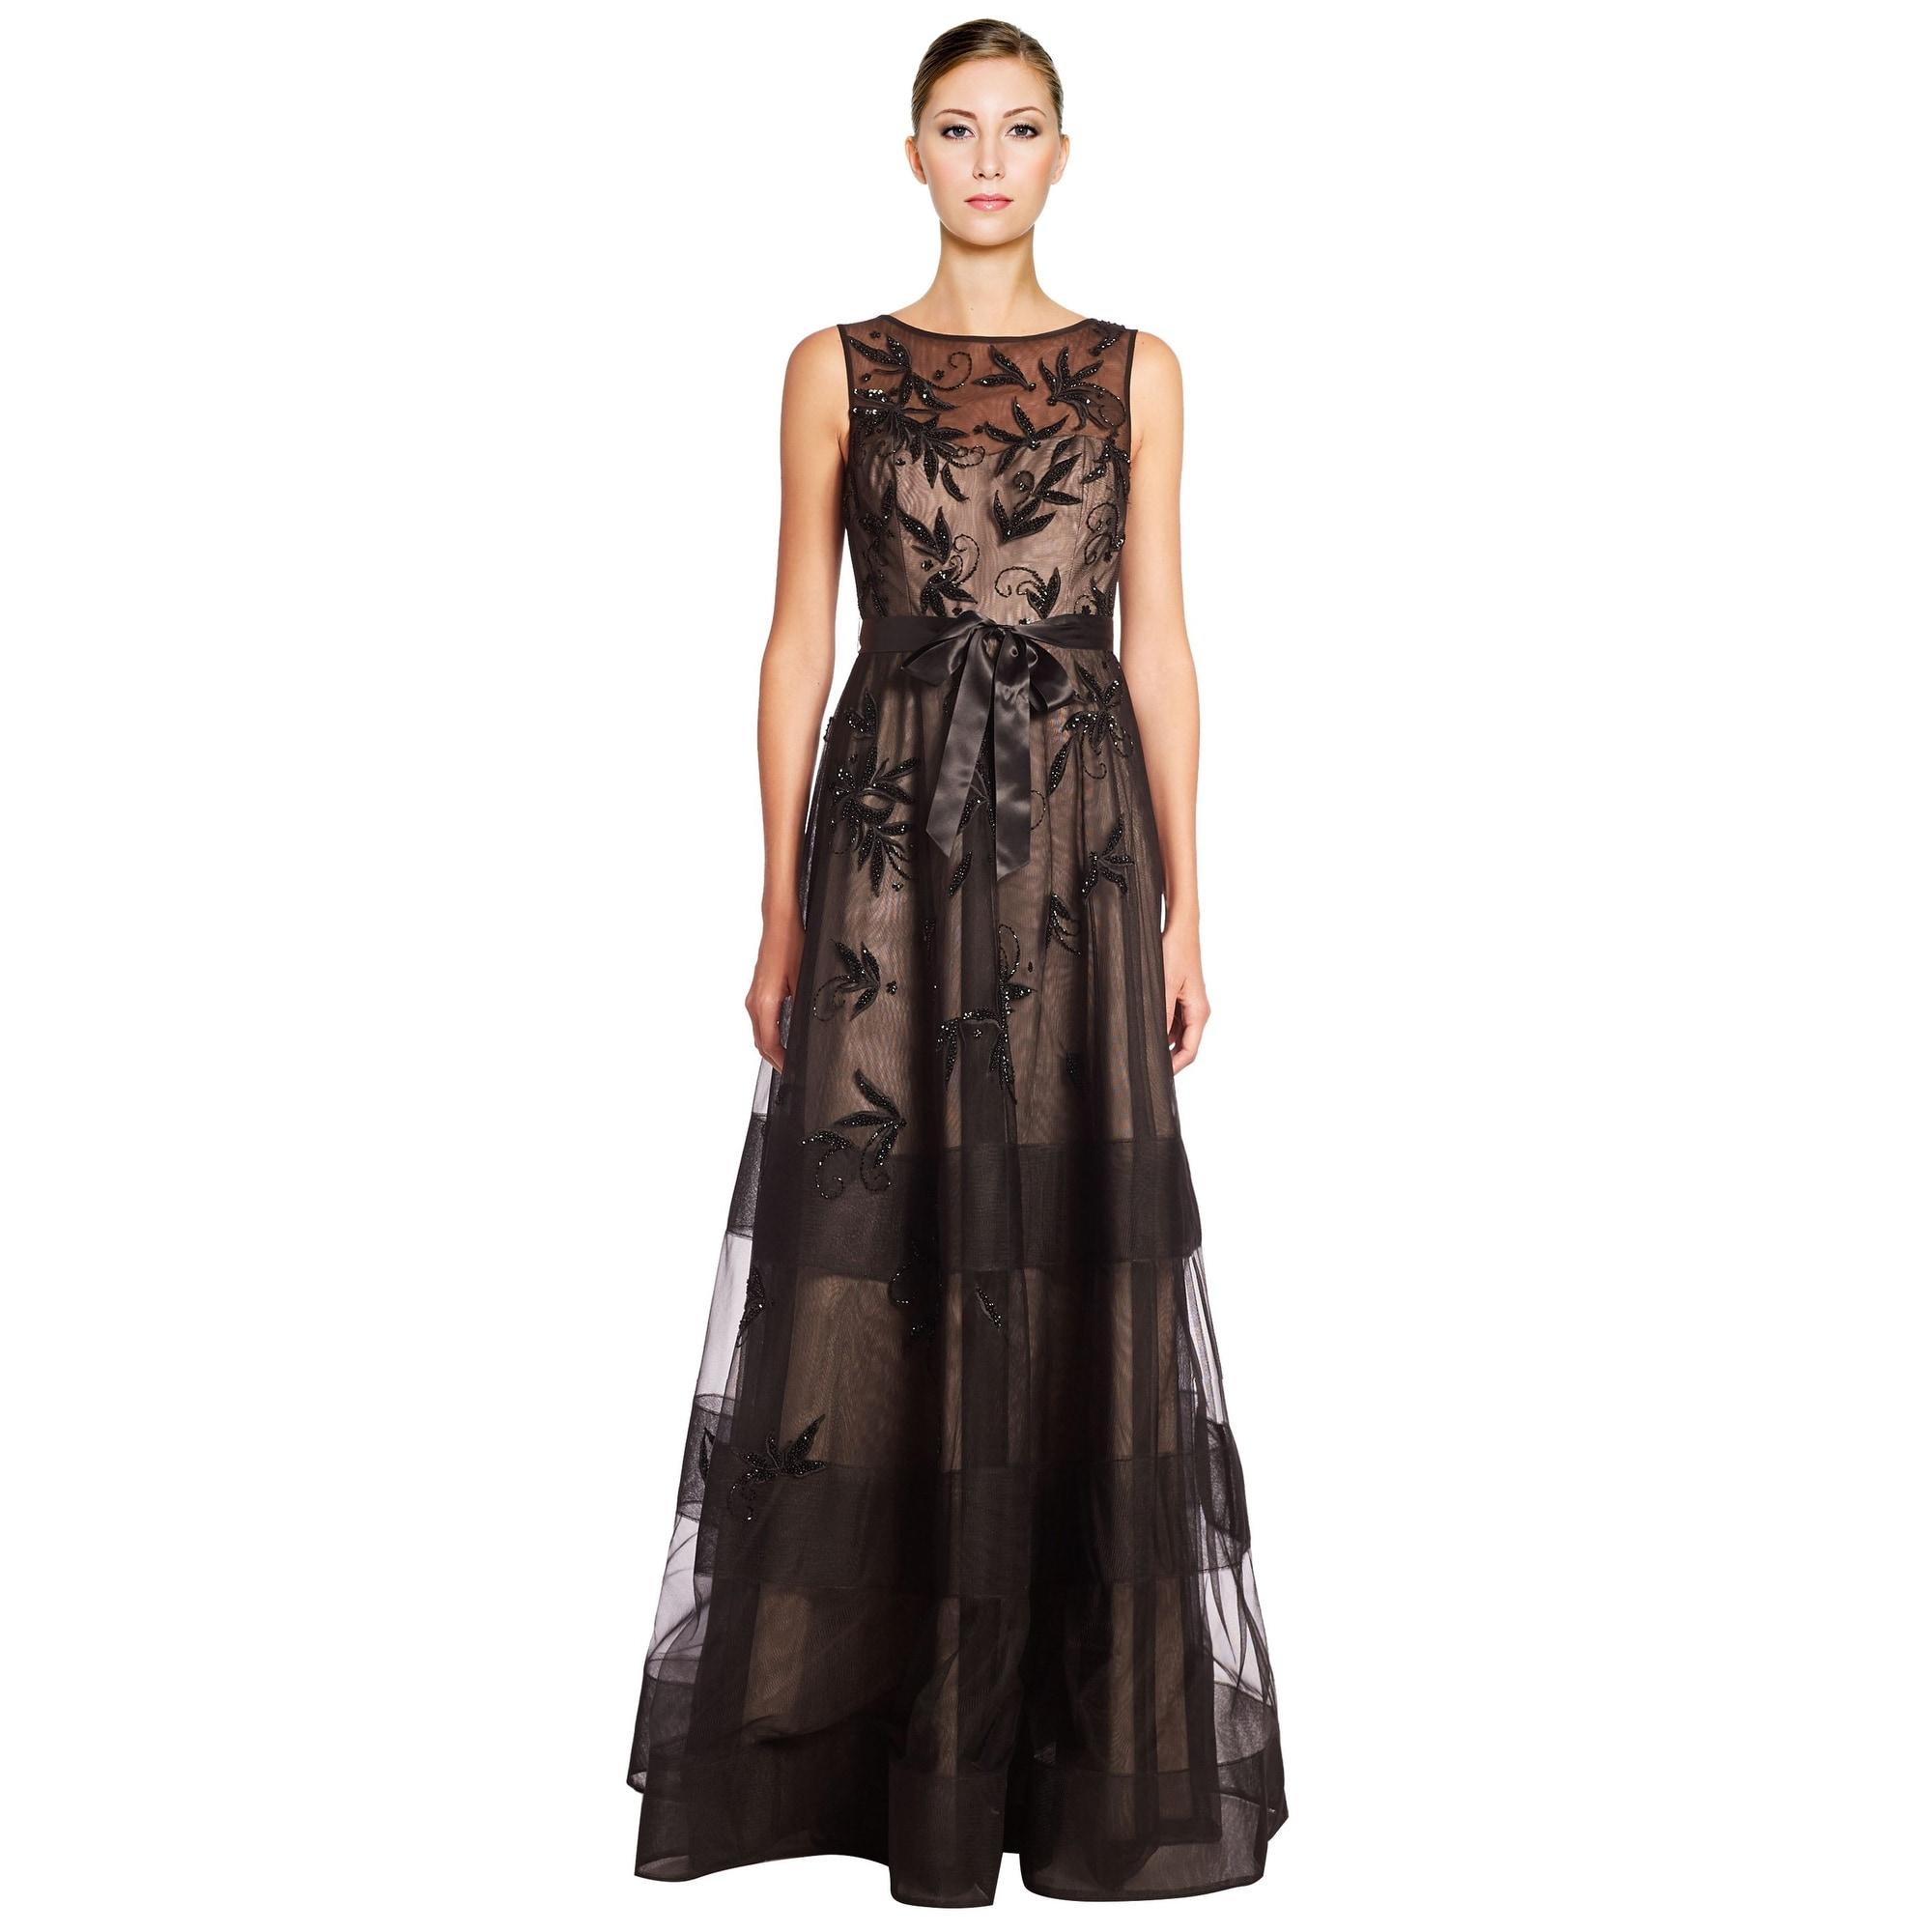 Teri Jon Floral Applique Embellished Tulle Evening Gown Dress ...